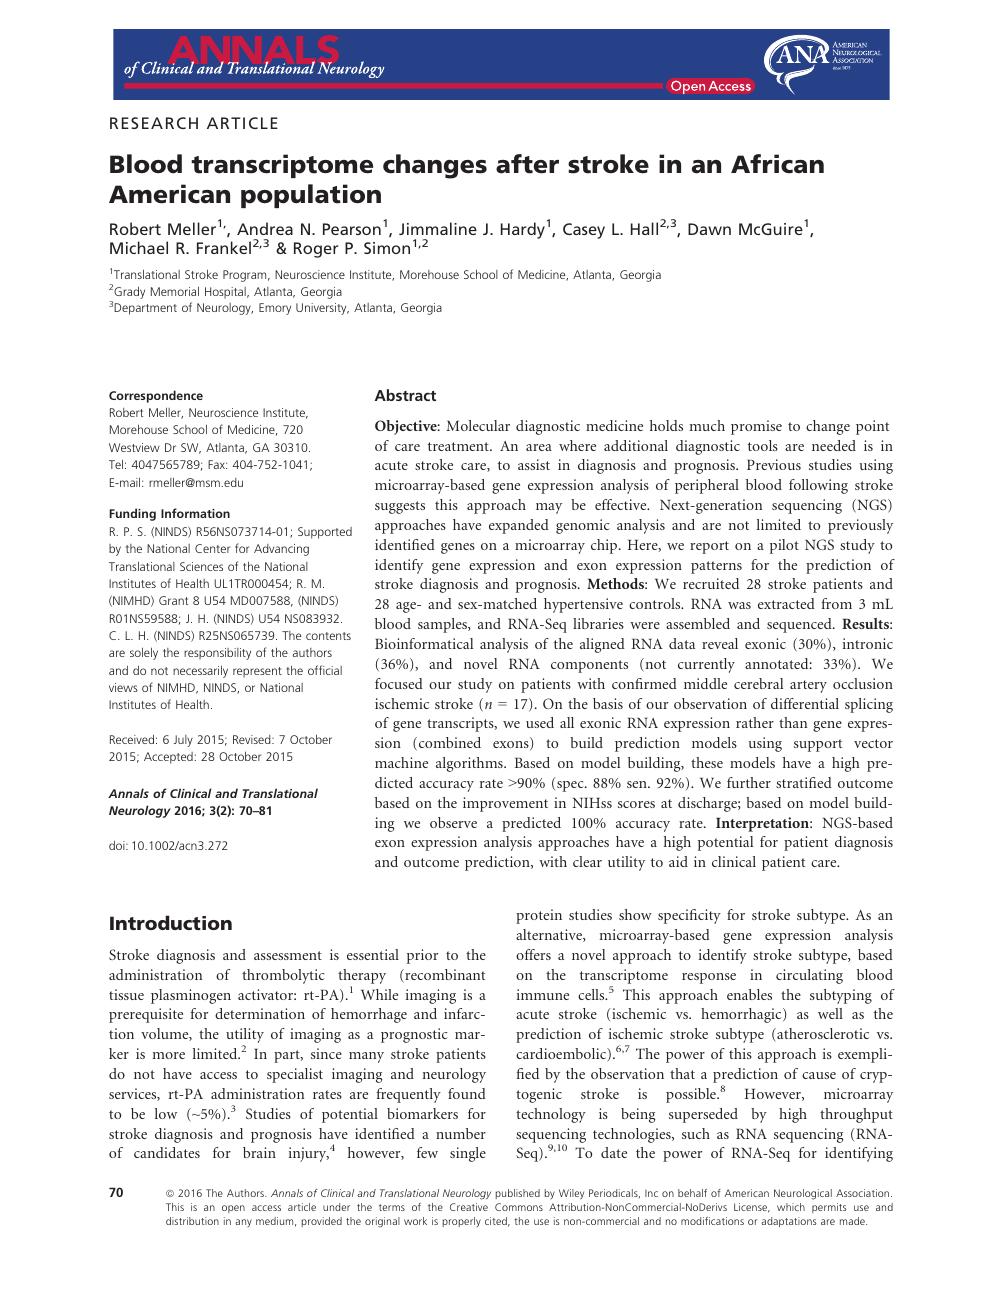 cdc african american chronic diseases